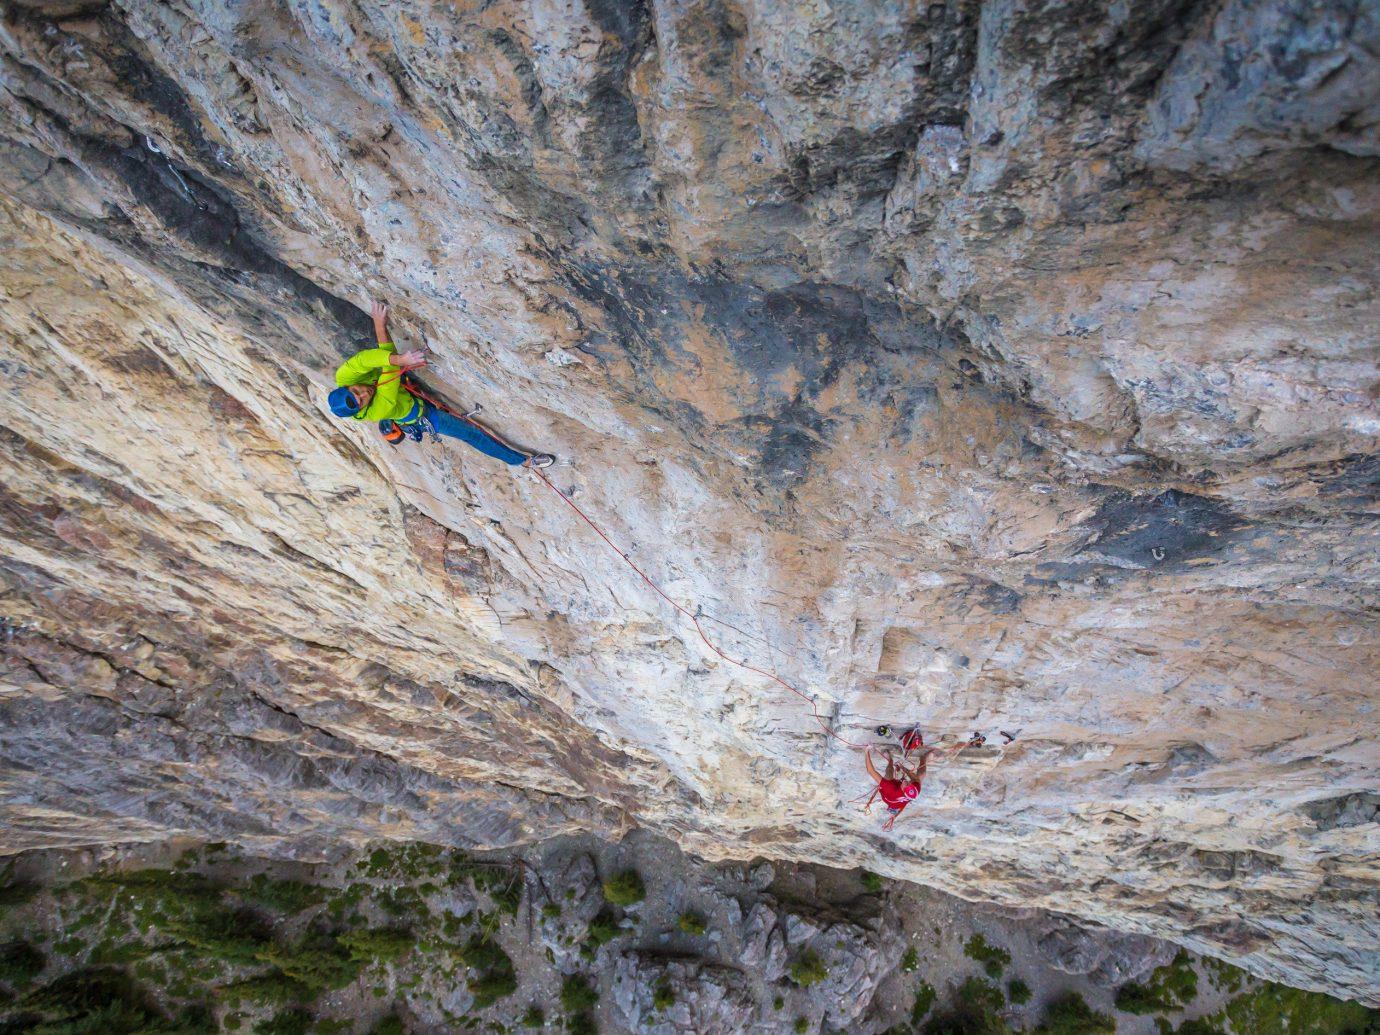 Trip Ideas outdoor climbing sport climbing Adventure sports colorful rock climbing geological phenomenon outdoor recreation recreation extreme sport cliff free solo climbing terrain colored